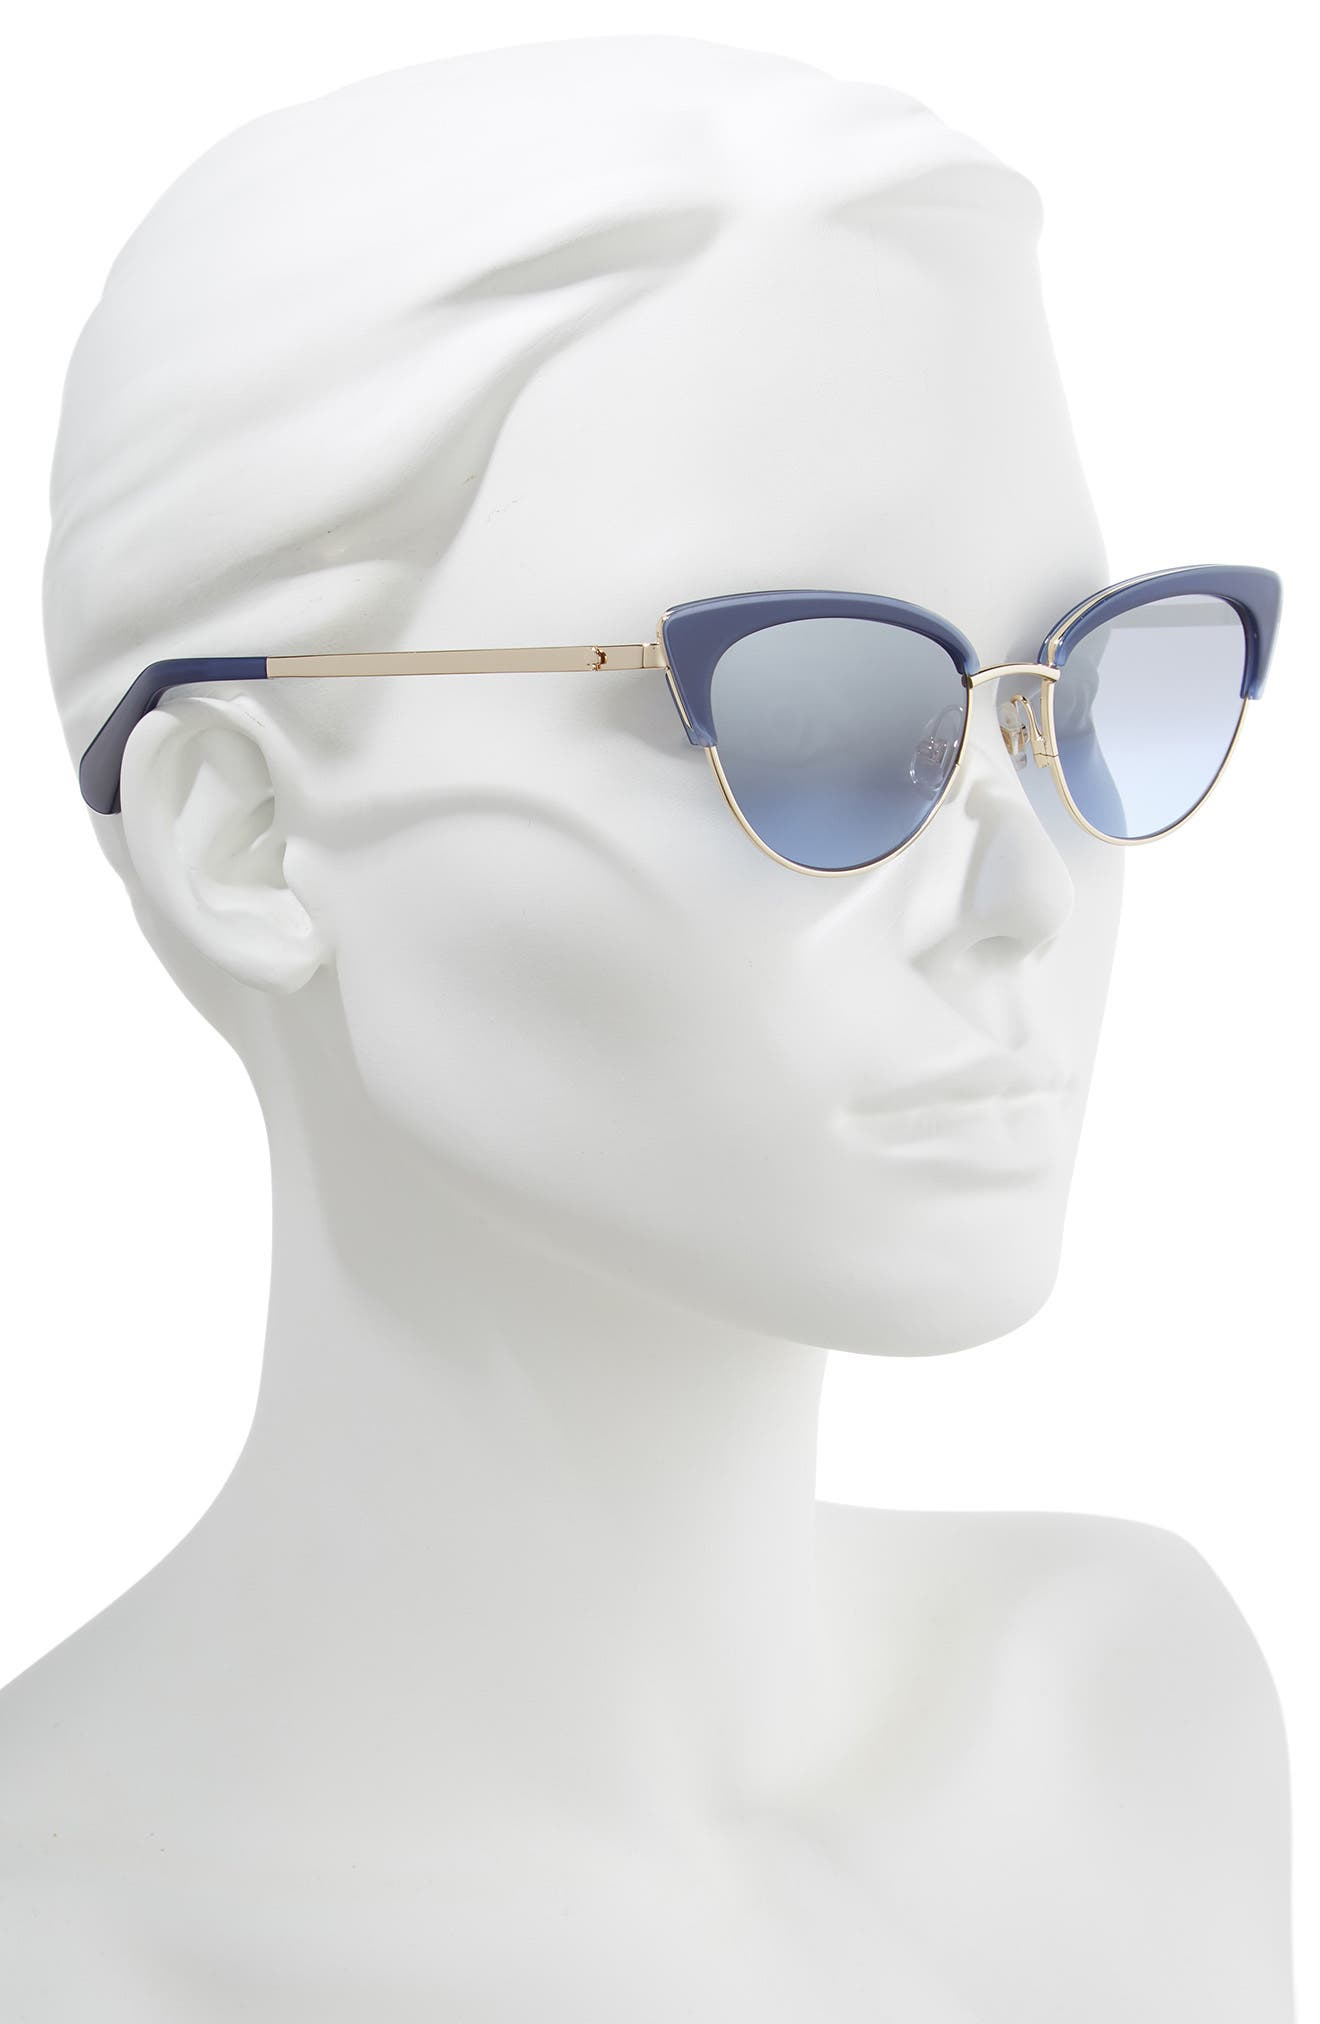 KATE SPADE NEW YORK,                             jahnams 52mm cat eye sunglasses,                             Alternate thumbnail 2, color,                             BLUE